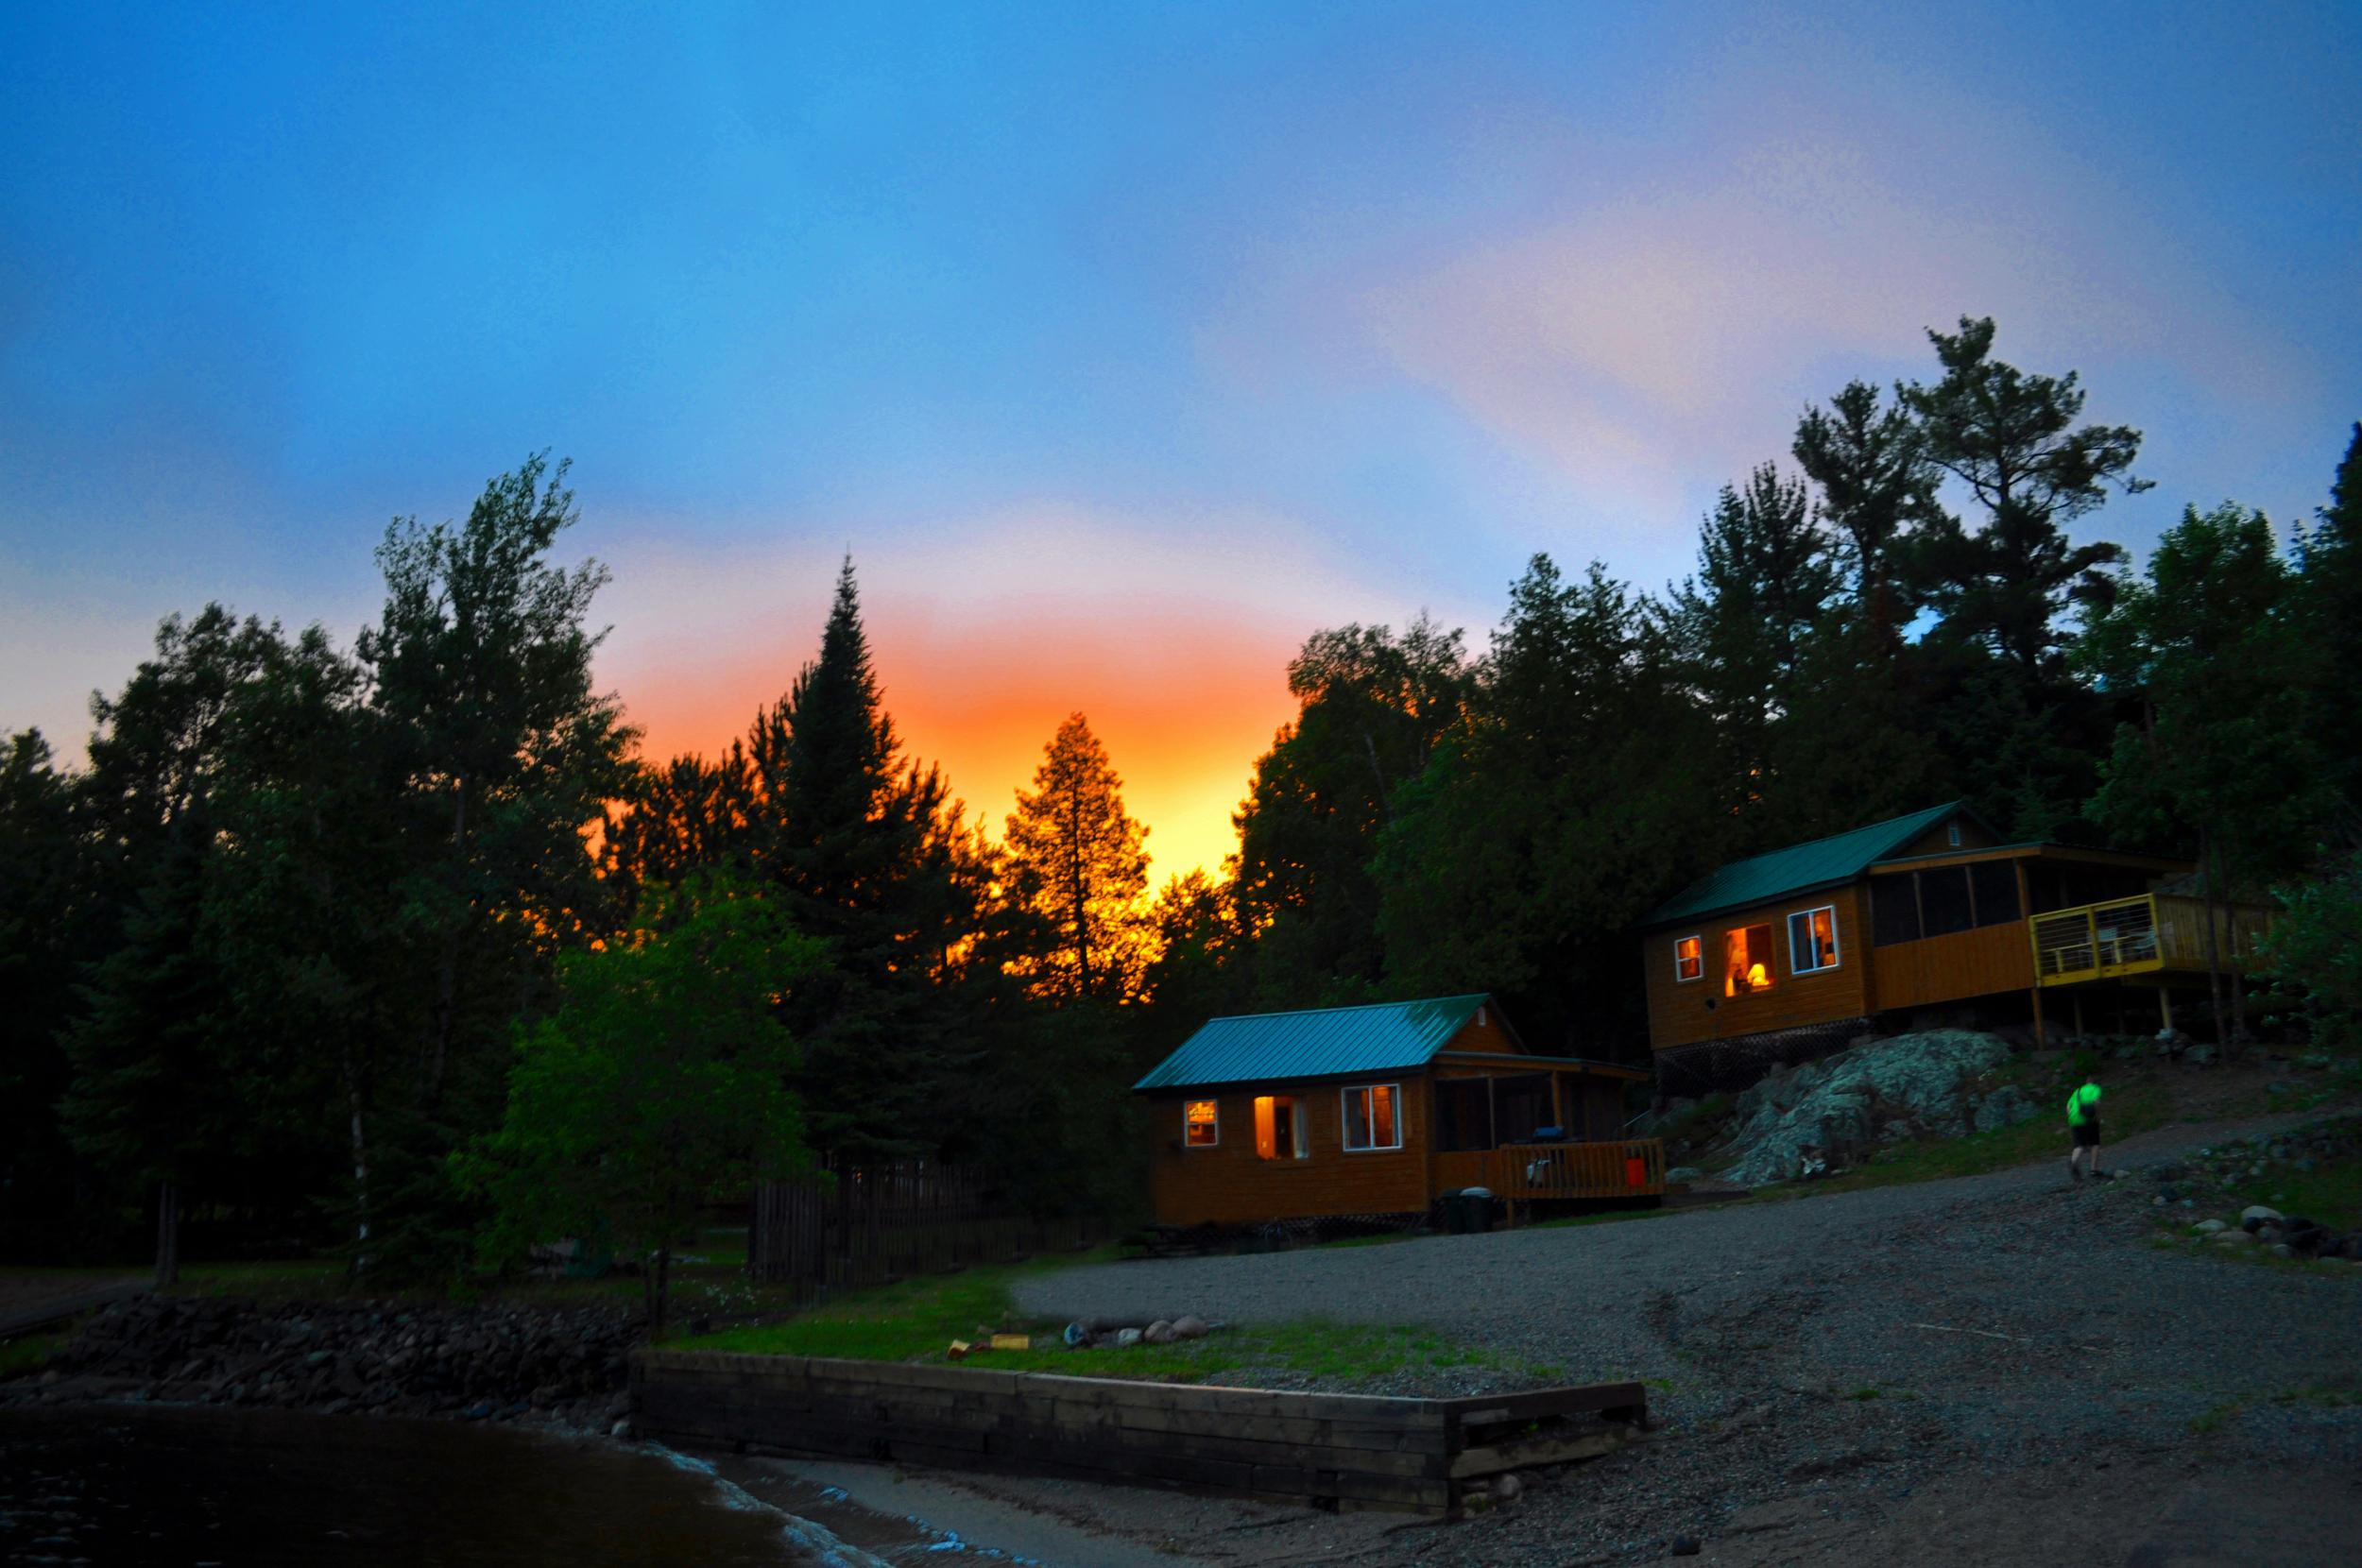 Ely Brilliant Sunset Over Cabin 2009 EDIT copy 2.jpg